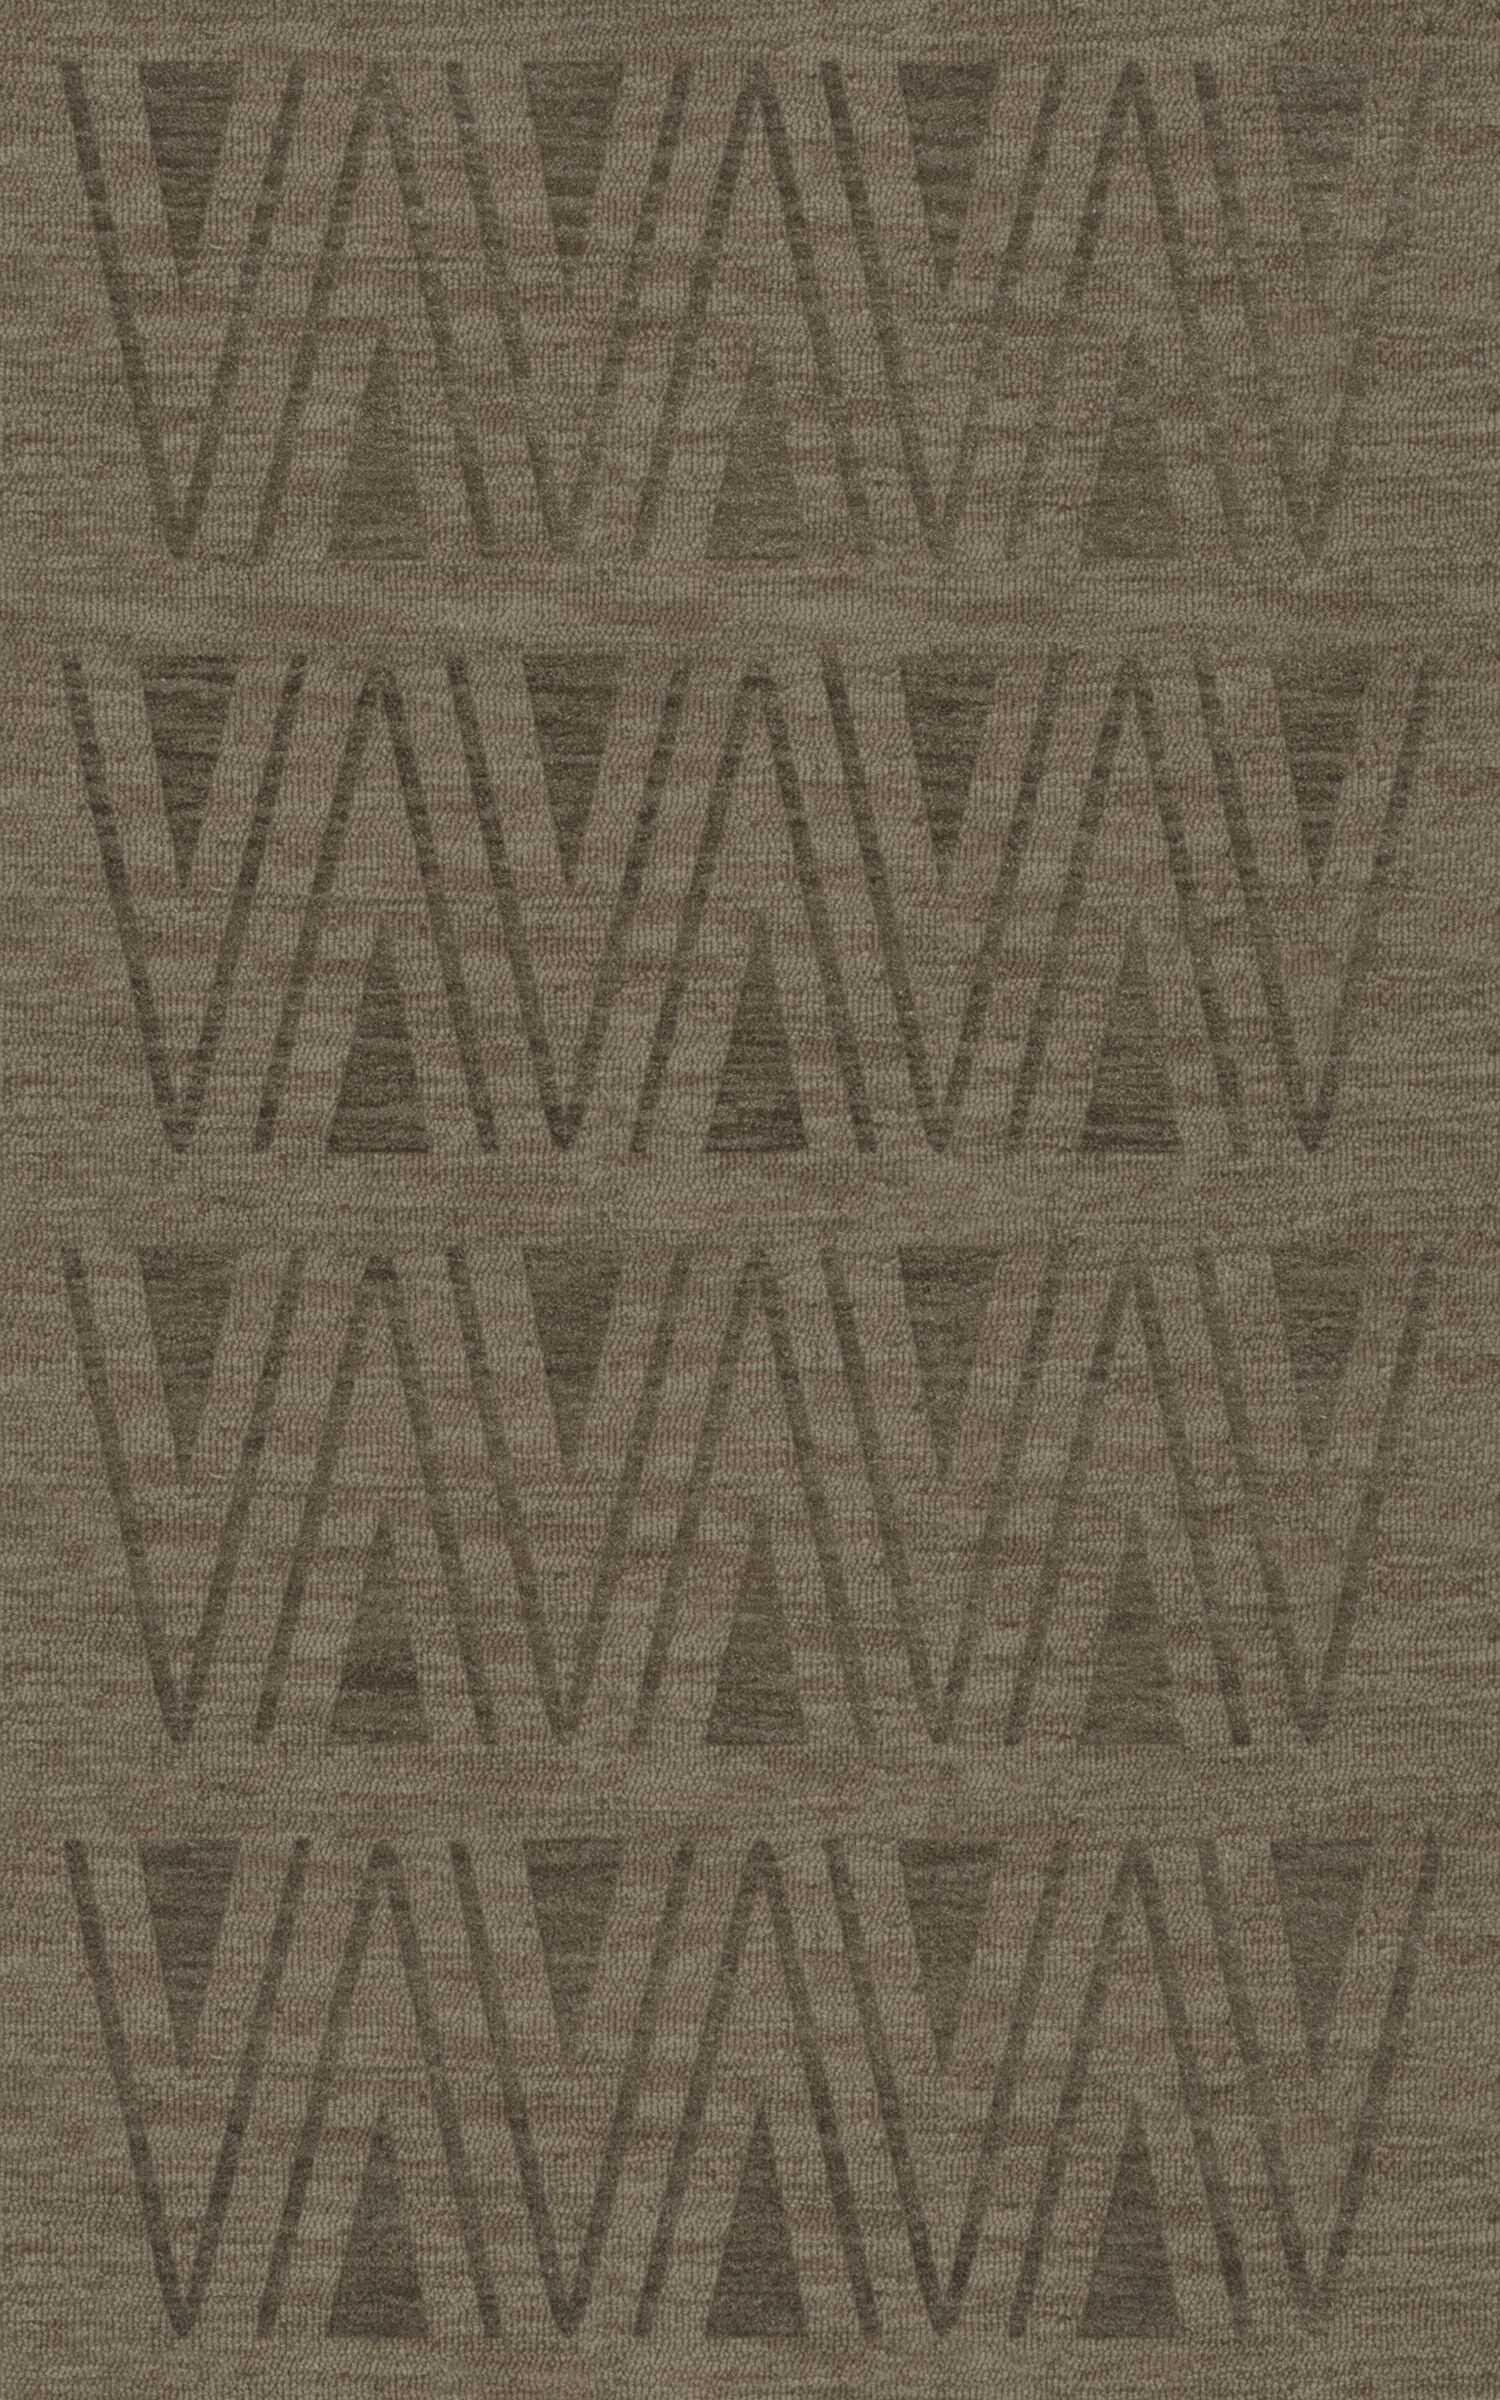 Bella Machine Woven Wool Gray Area Rug Rug Size: Rectangle 5' x 8'